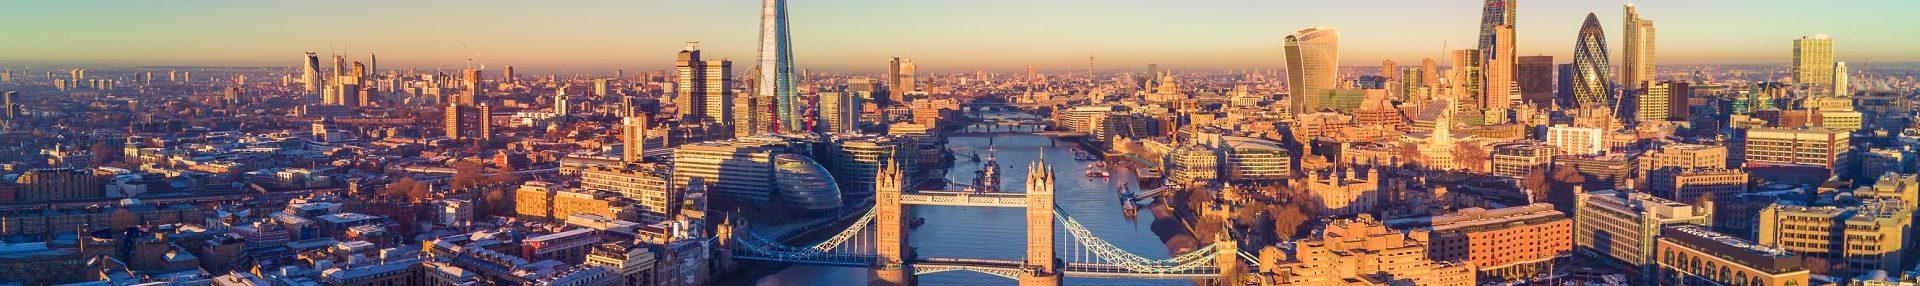 London City Skyline Banner